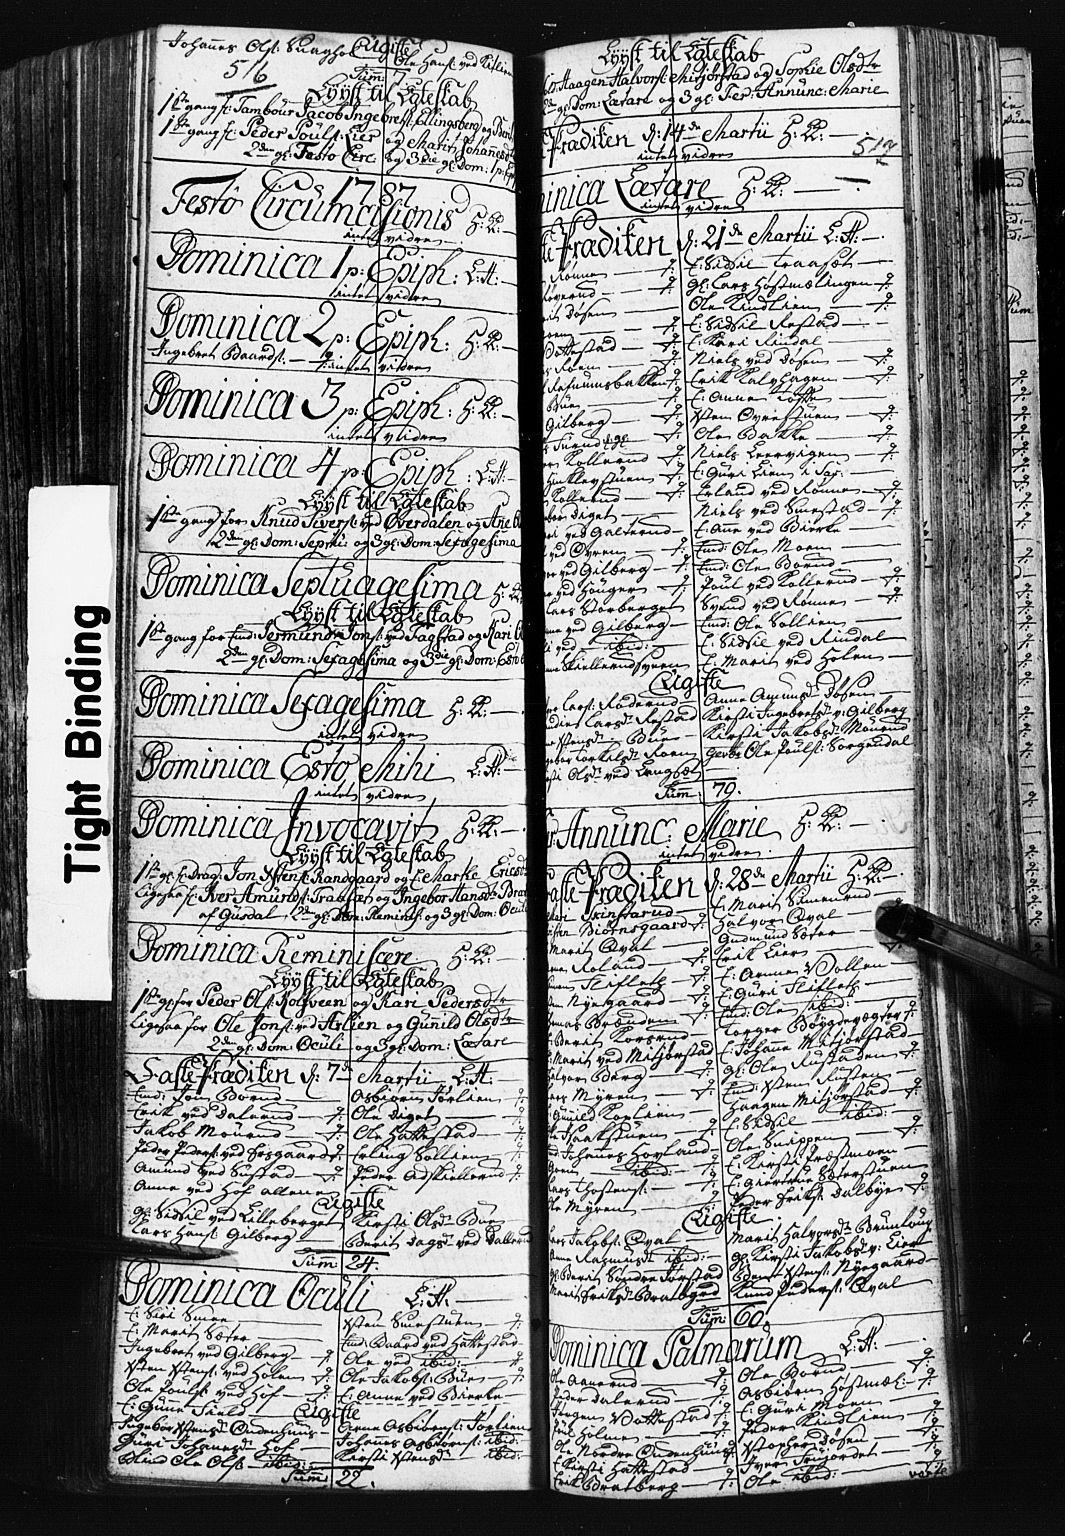 SAH, Fåberg prestekontor, Klokkerbok nr. 3, 1768-1796, s. 516-517